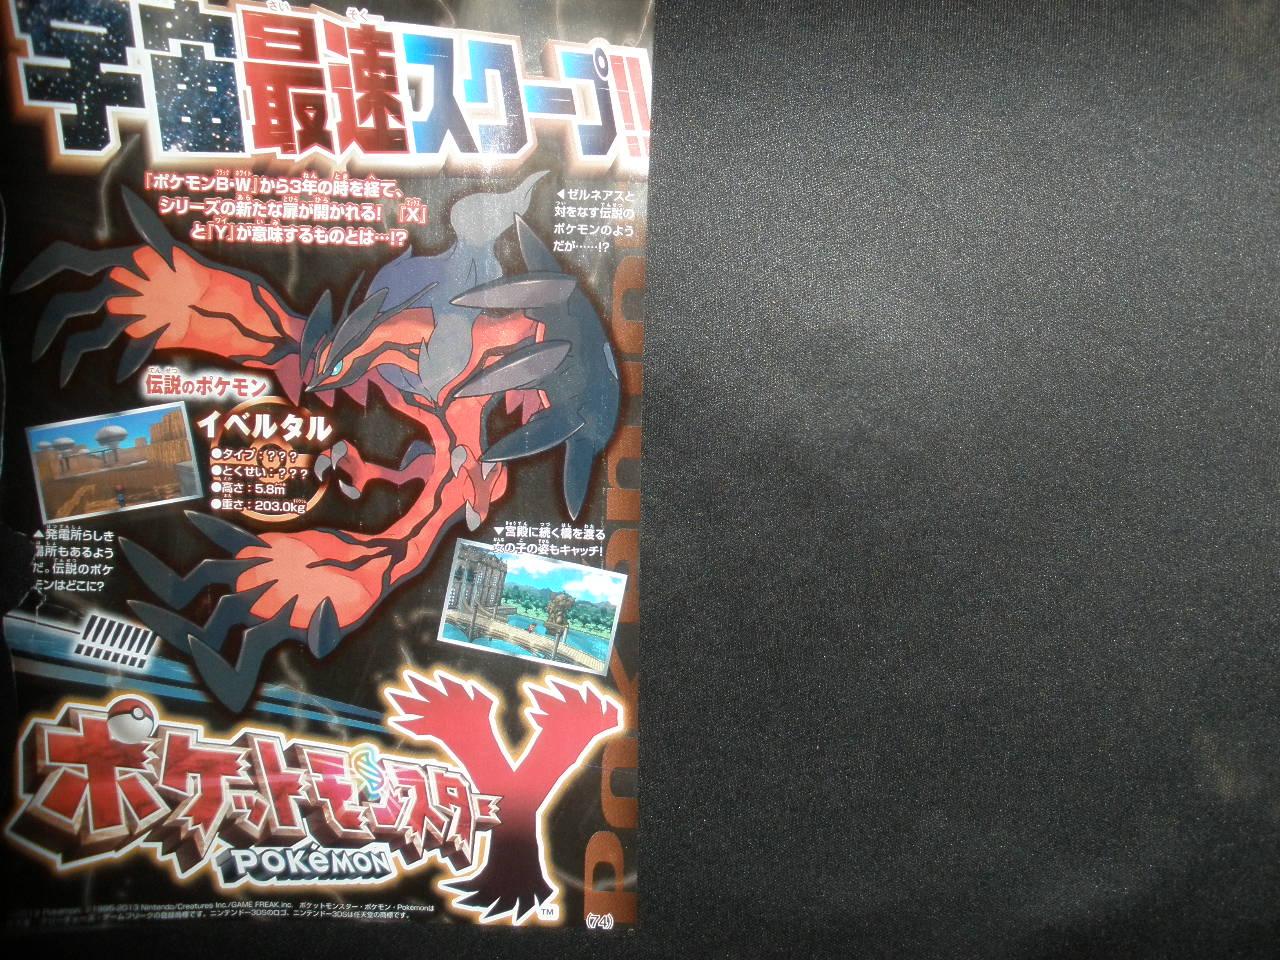 http://blog-imgs-43.fc2.com/a/n/k/ankosokuho/wwwdotuprg3832038.jpg